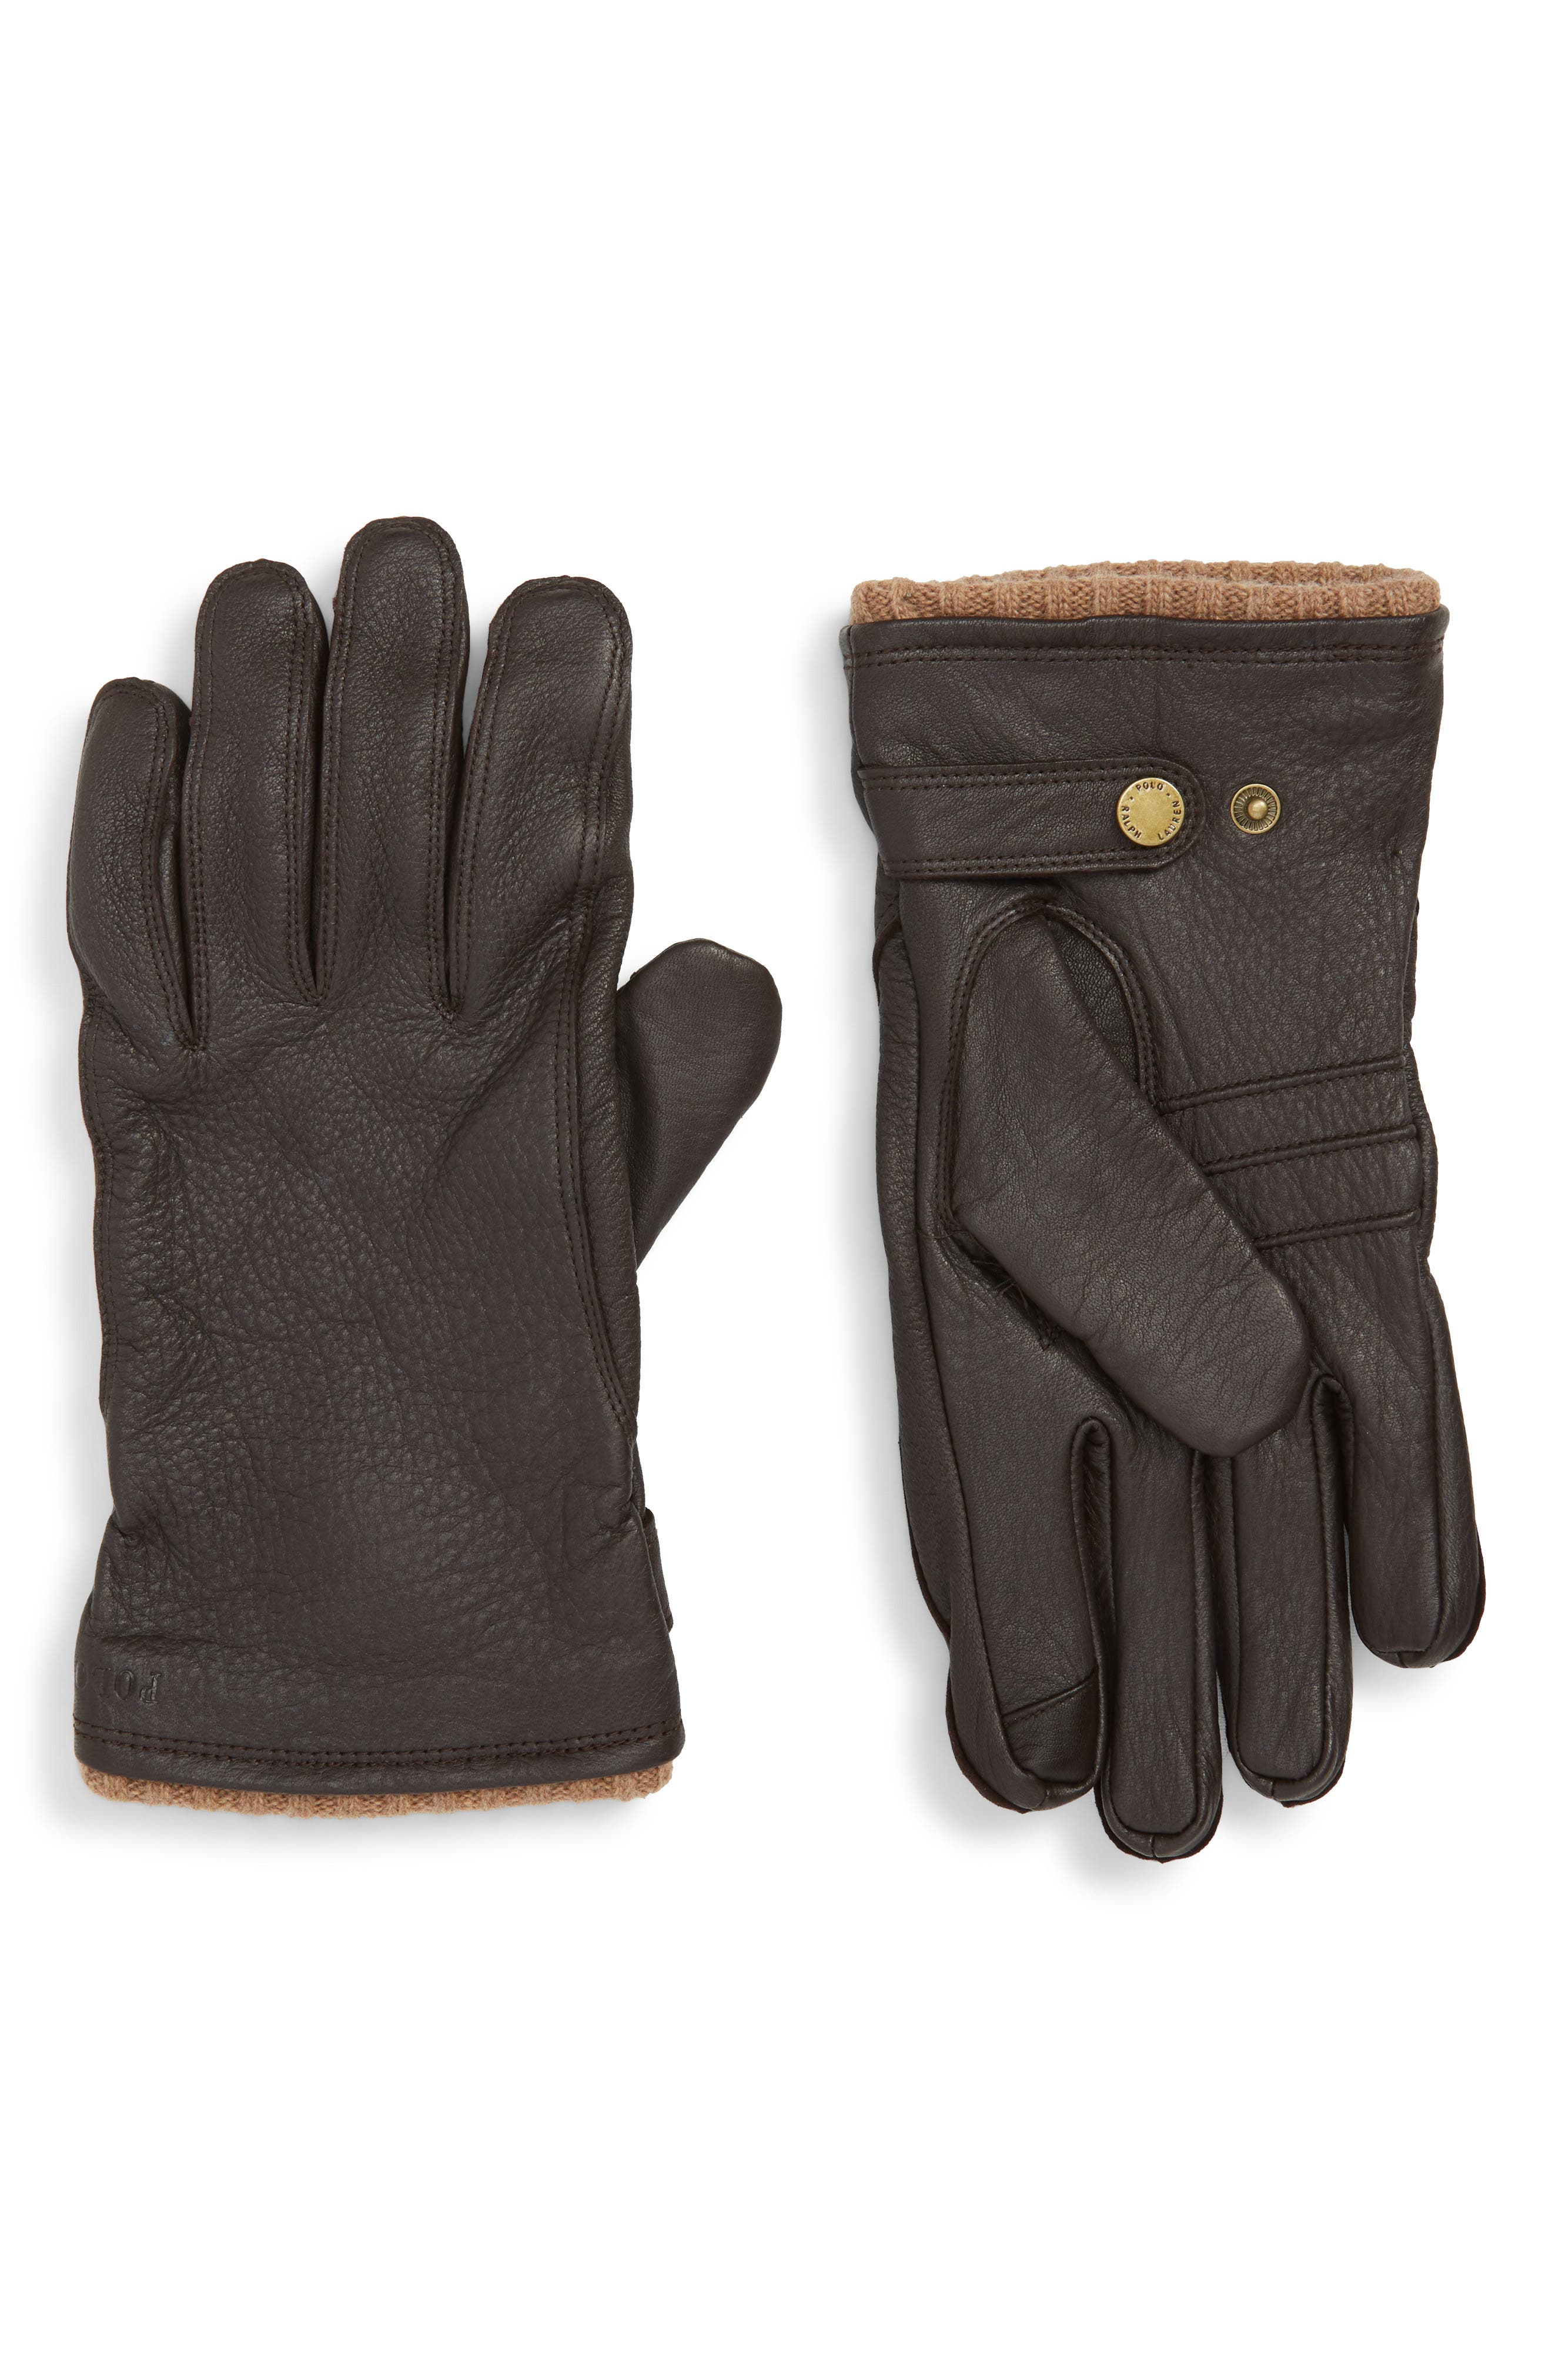 POLO RALPH LAUREN, Deerskin Gloves, Main thumbnail 1, color, CIRCUIT BROWN